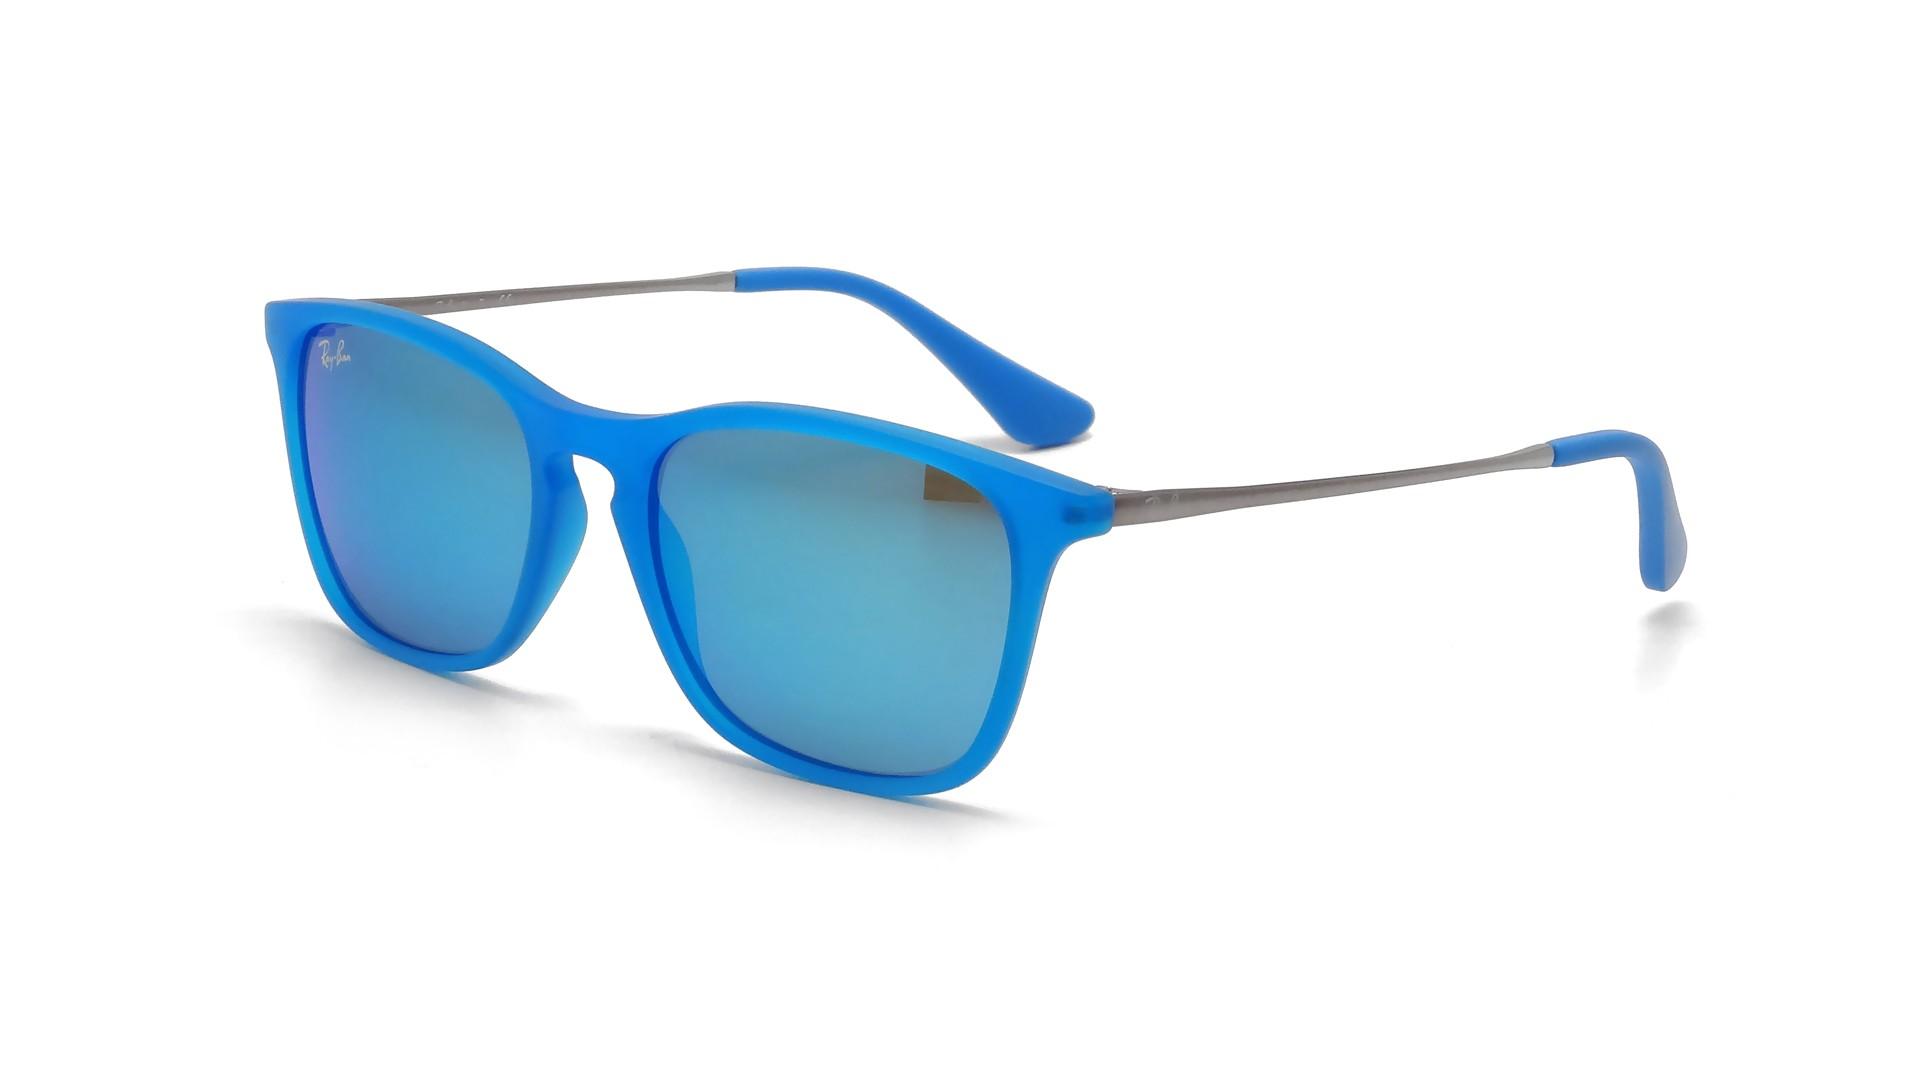 d8b711e2a1f6fd ban miroir bleu prix ray ban bleu prix